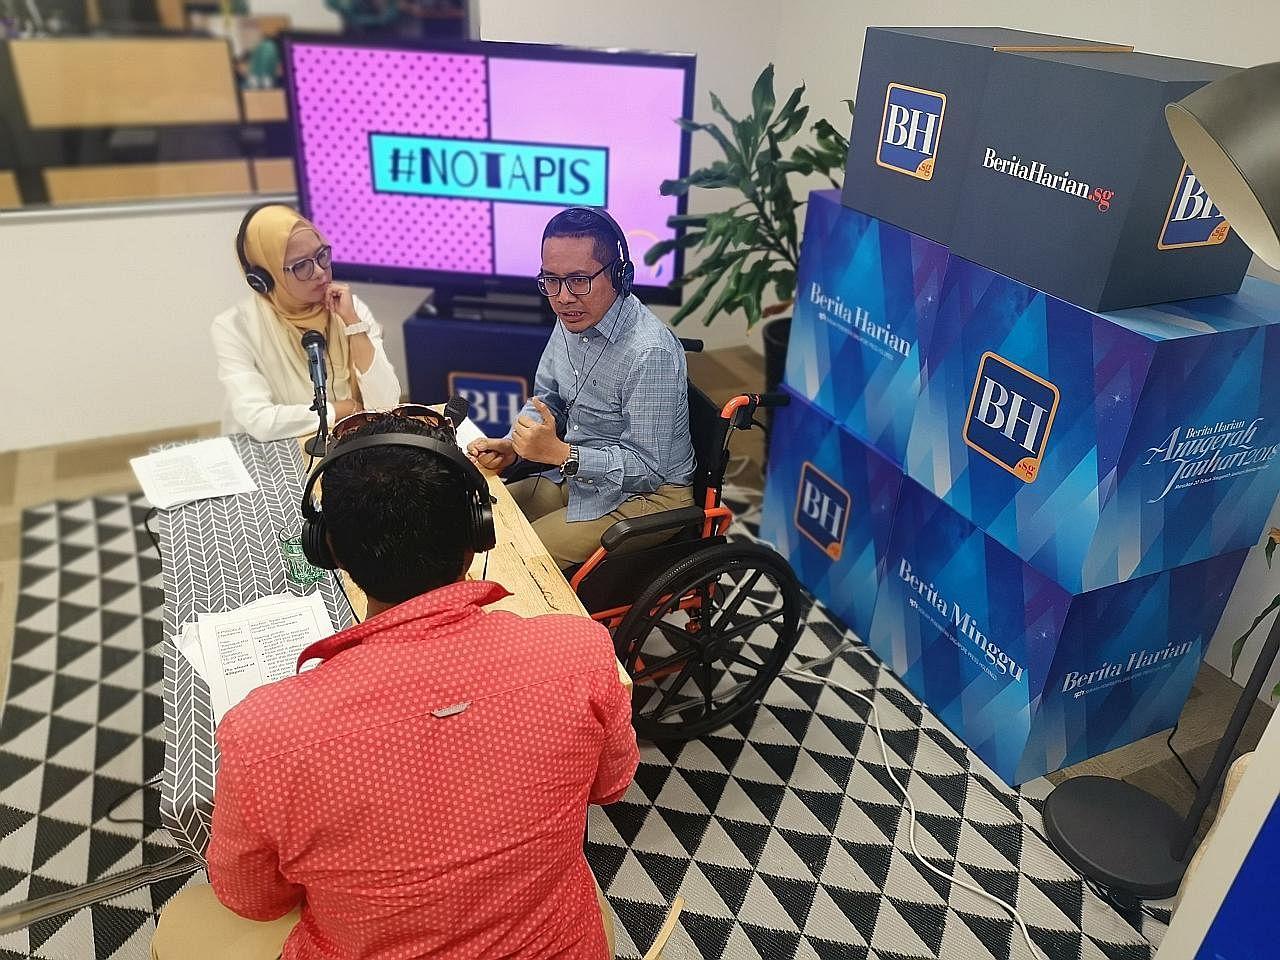 Ikuti 'podcast' #NoTapis bersama Riz, Nadiah M. Din